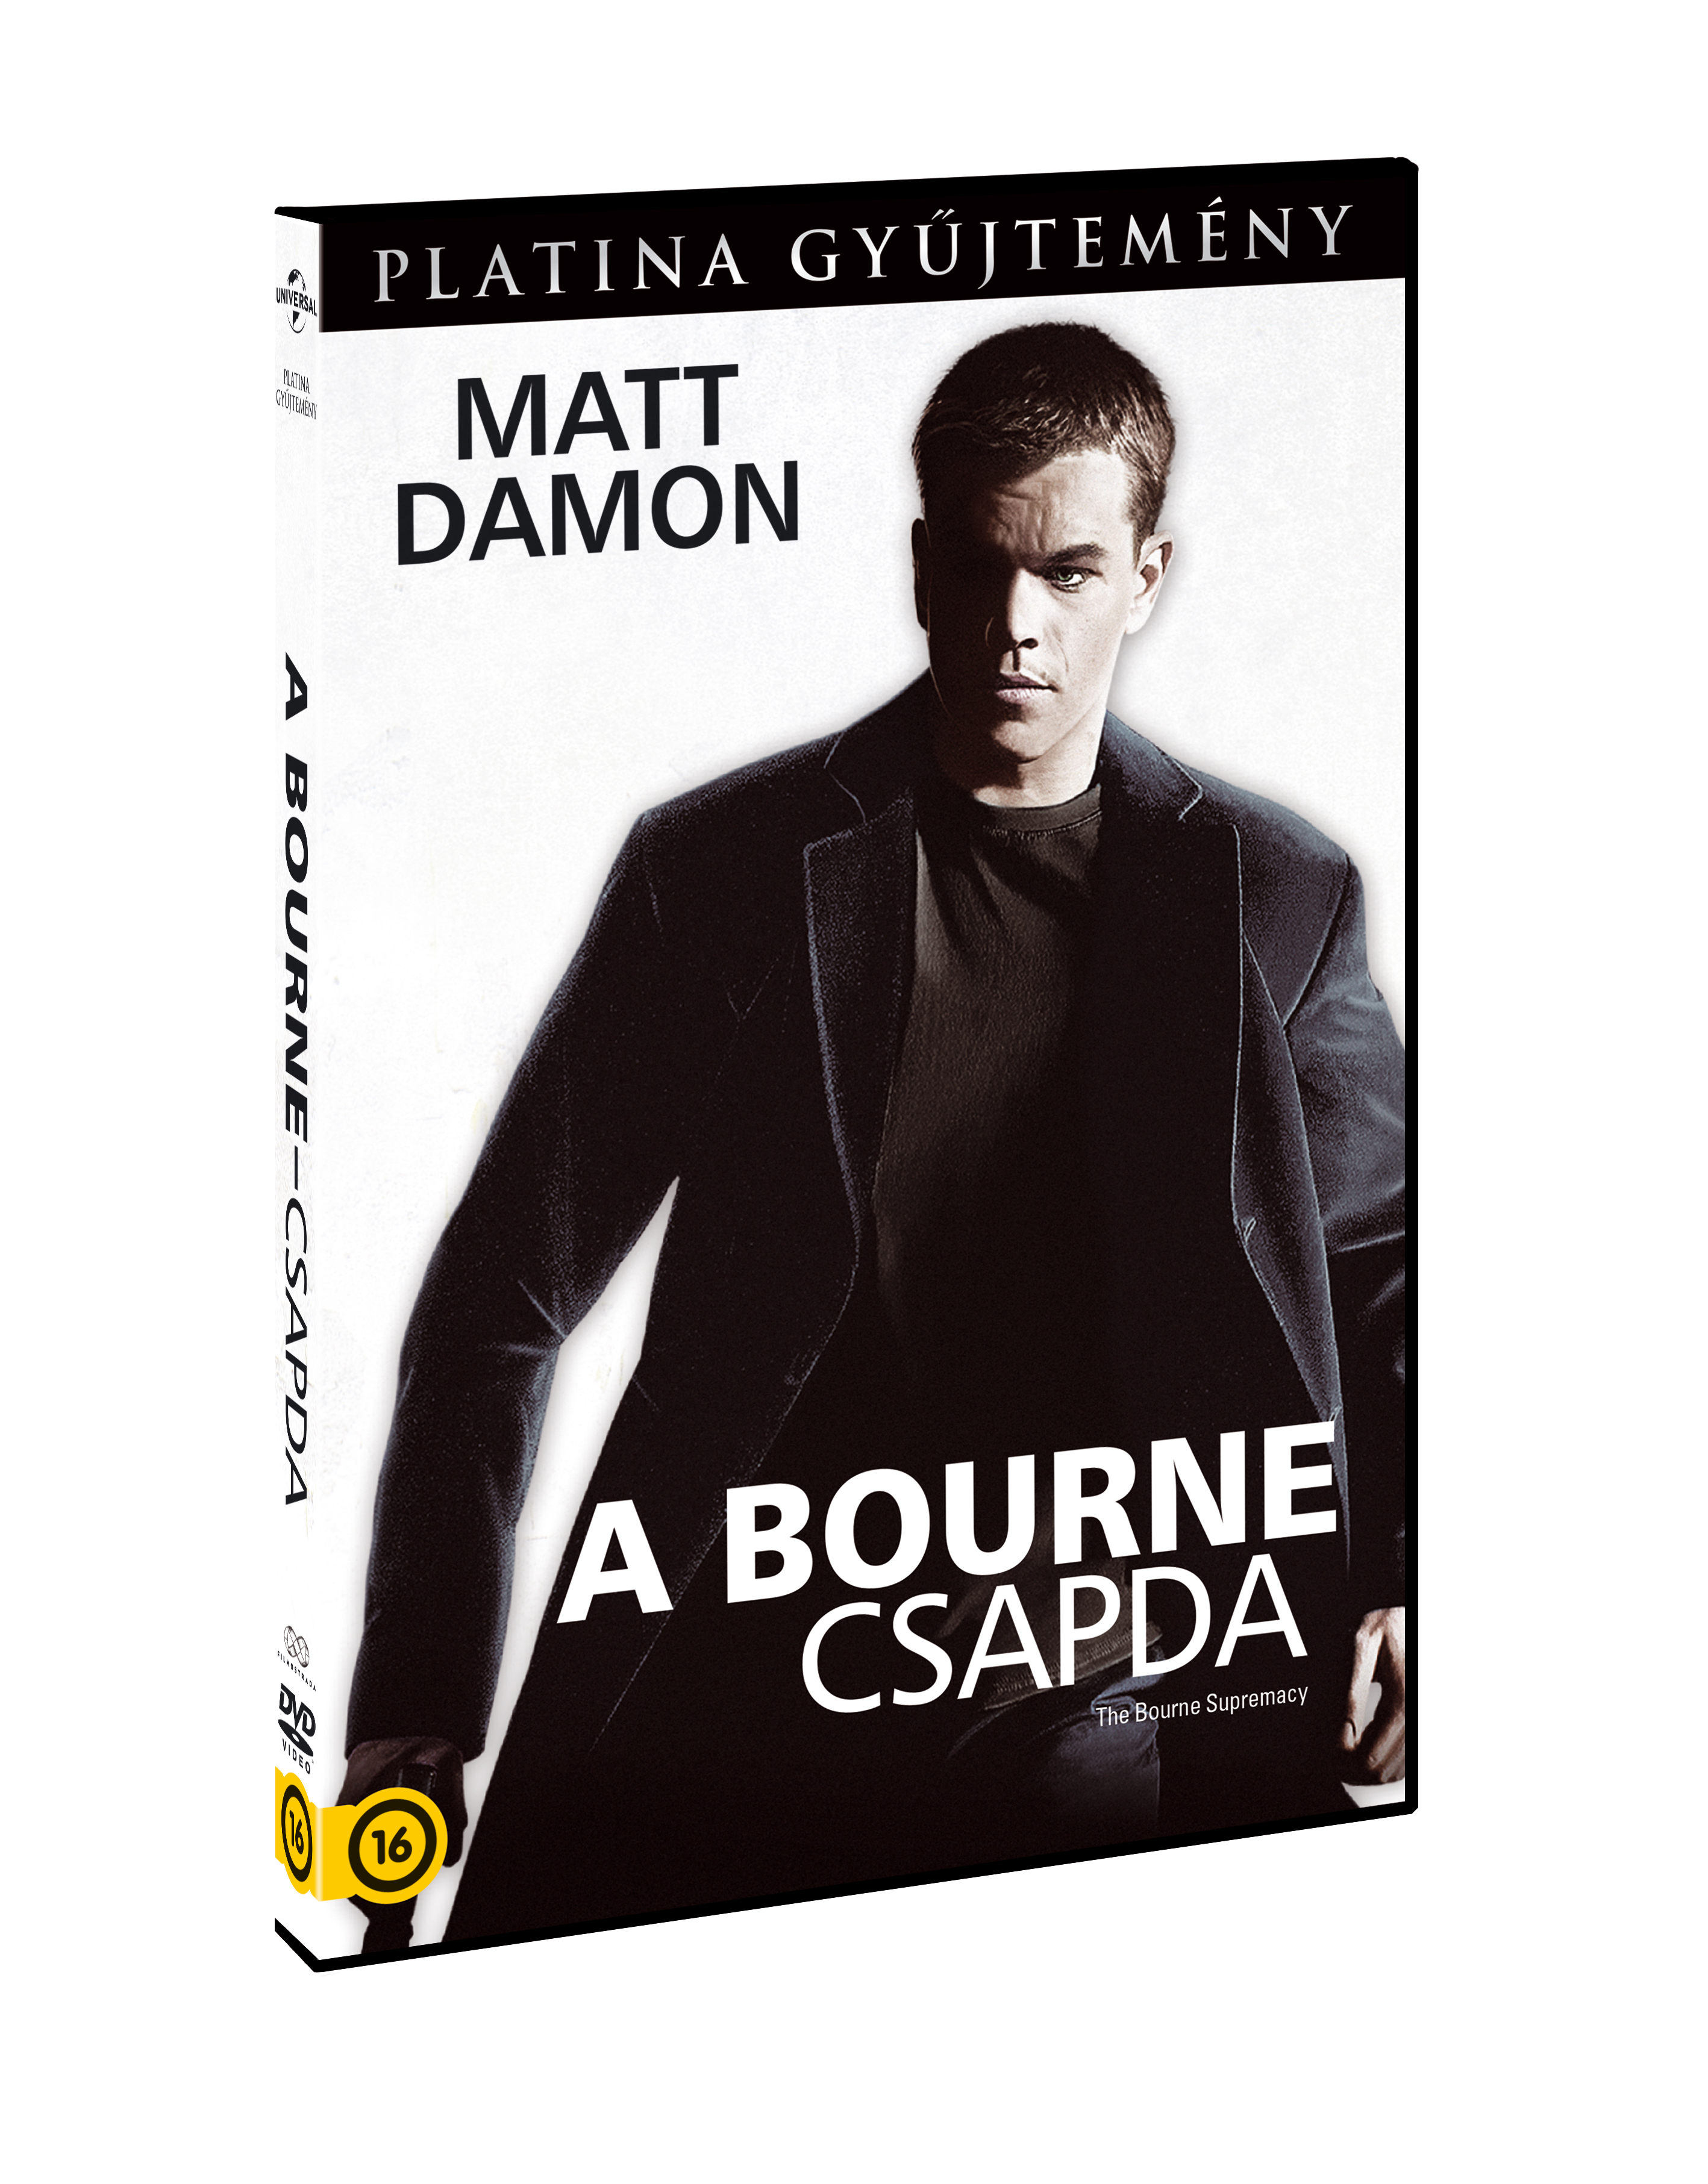 A Bourne csapda - DVD